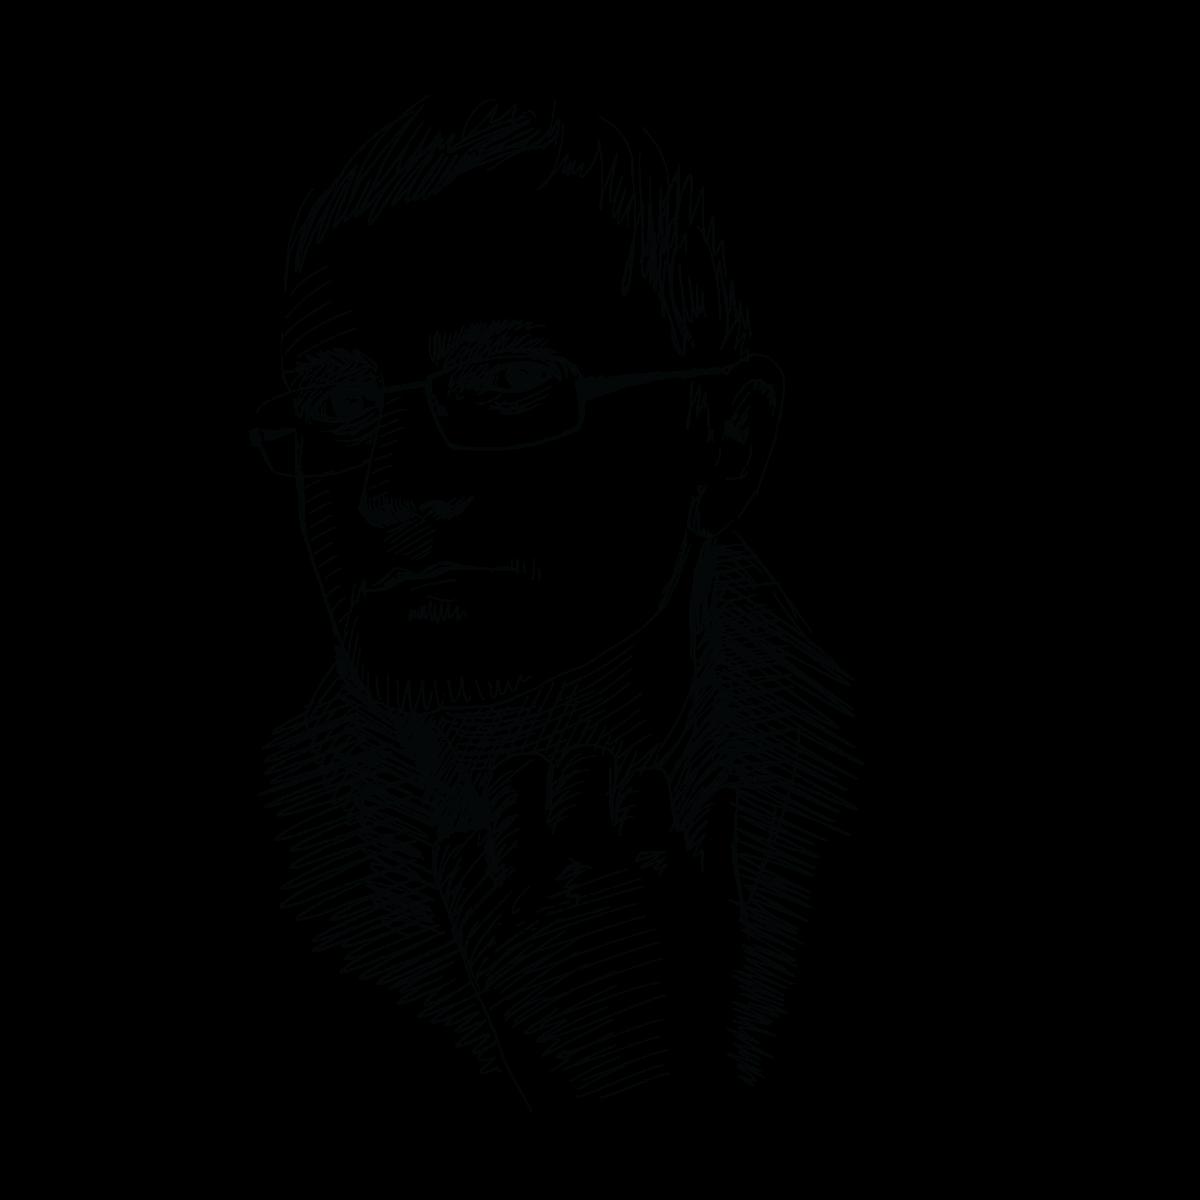 http://ra-zoom.kz/wp-content/uploads/2017/05/minimalist-image-team-member-03-large.png